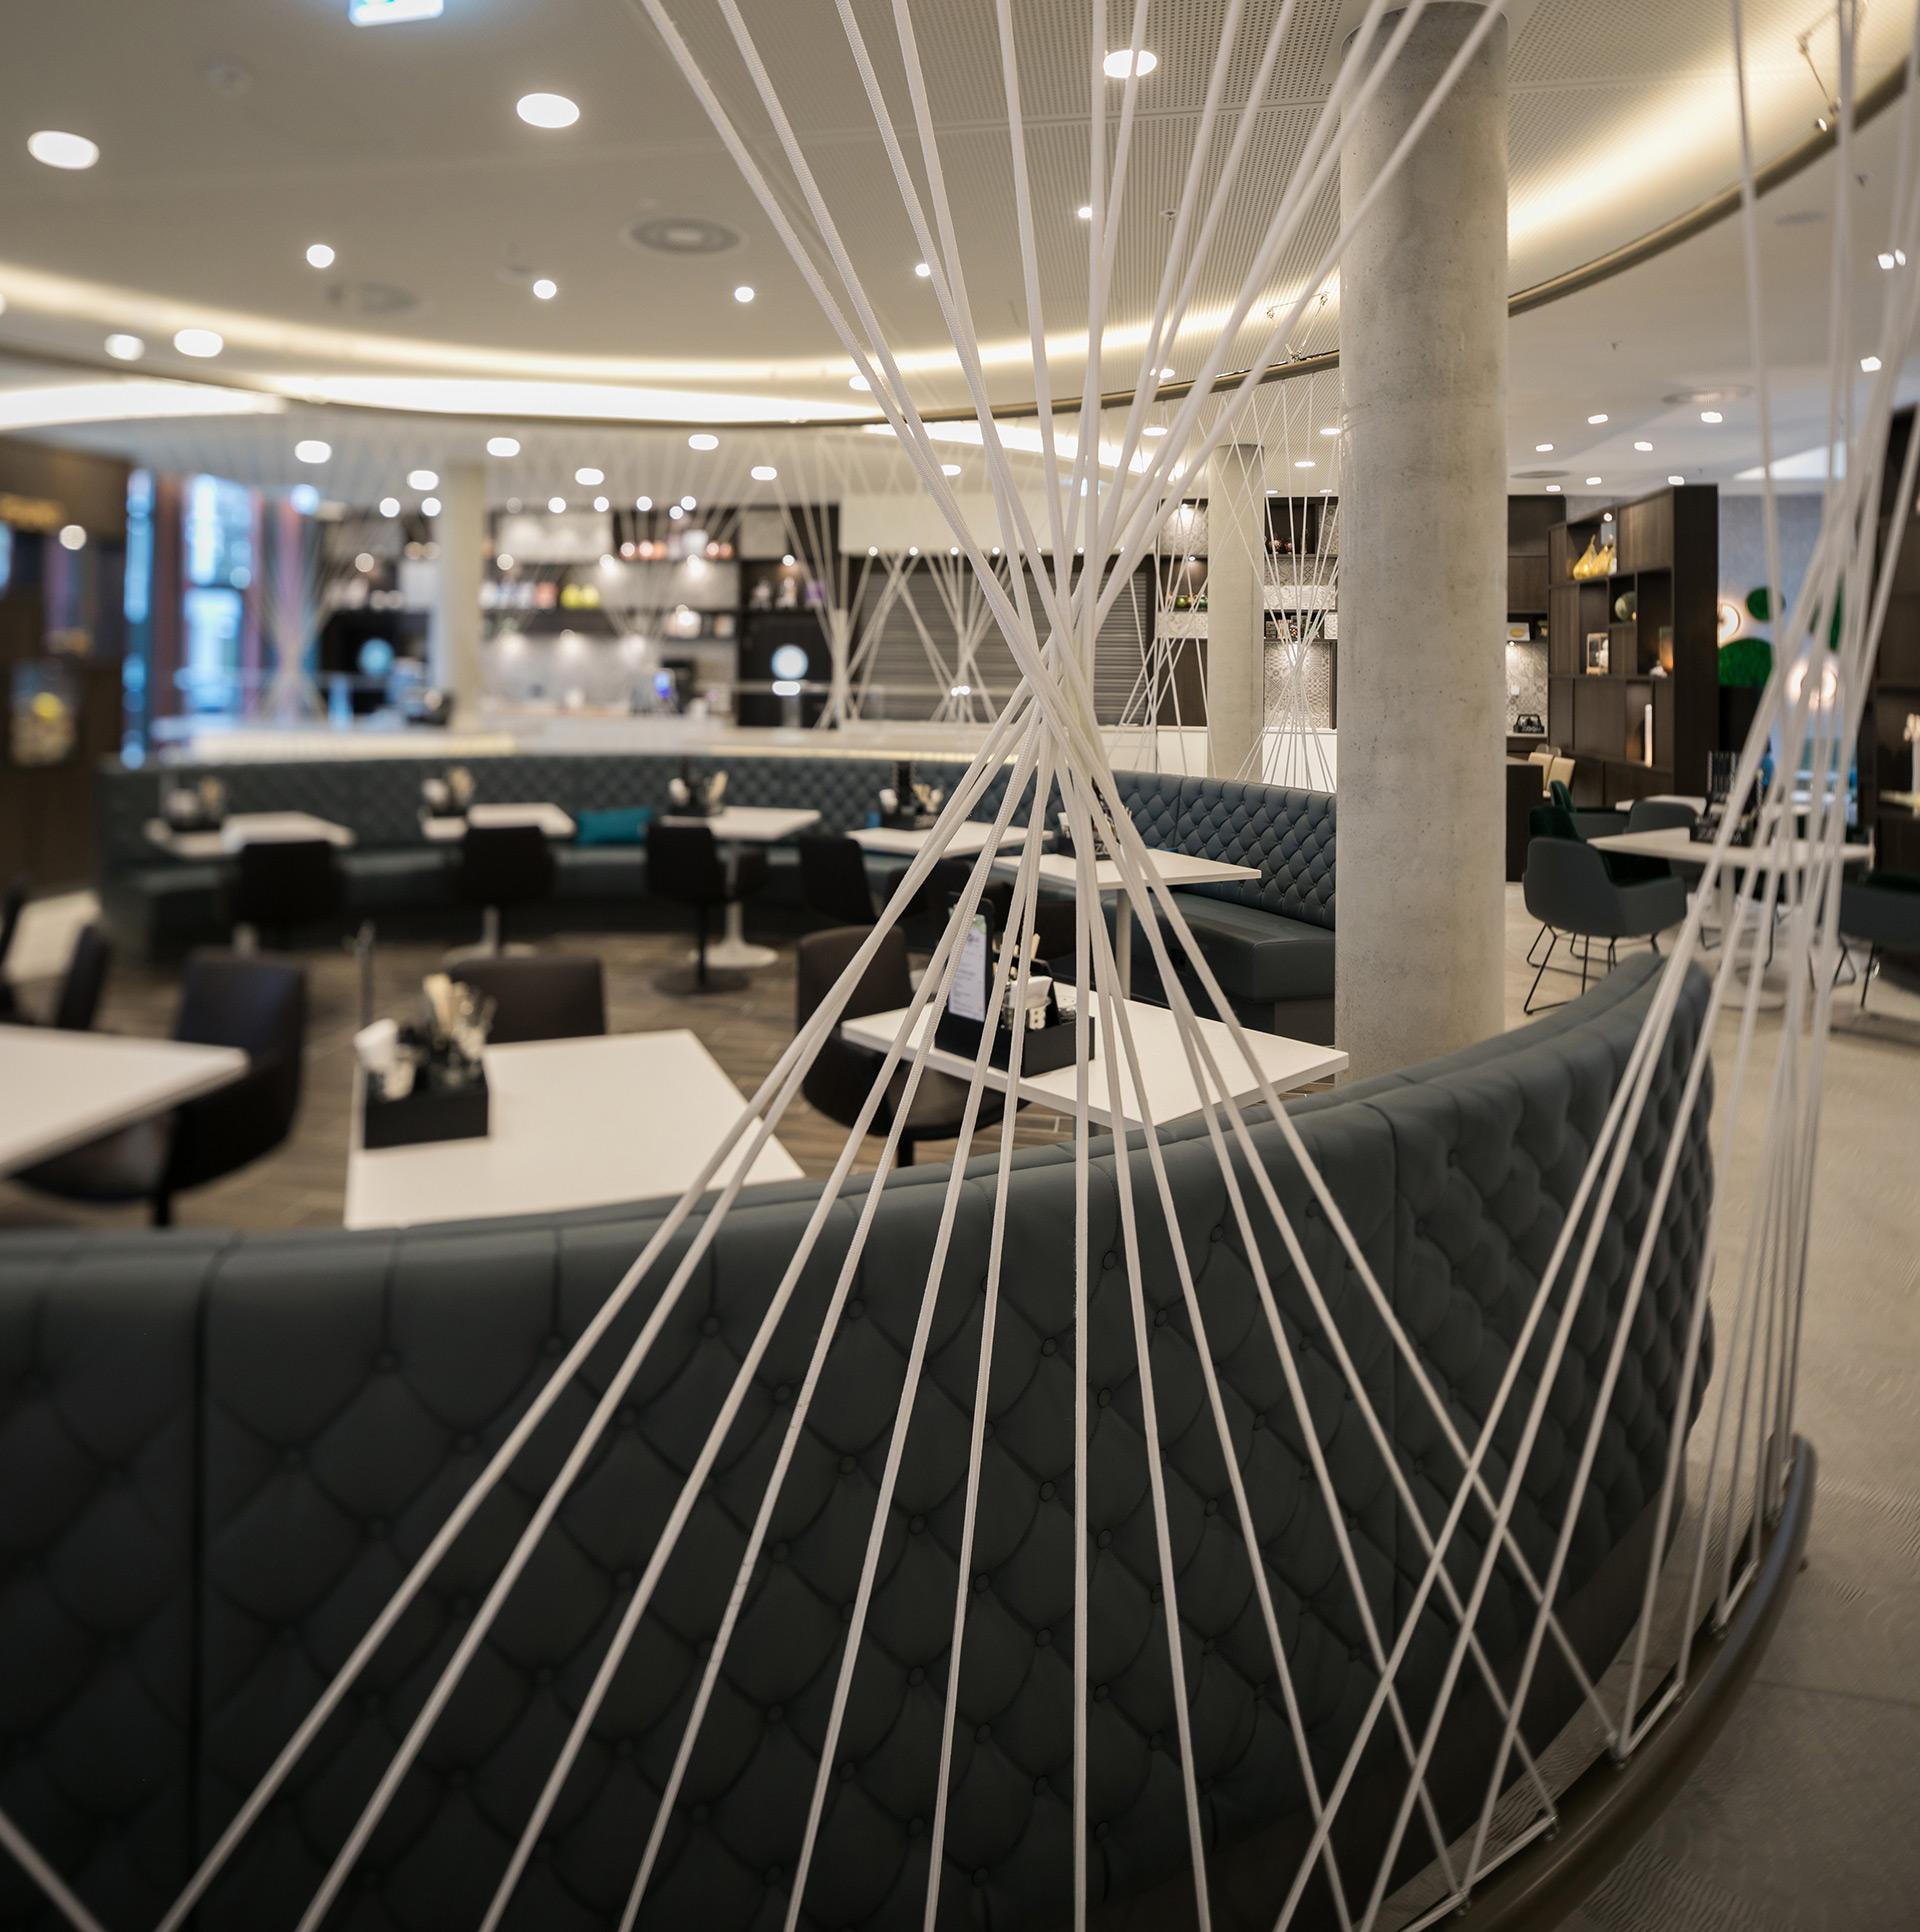 Hyatt place frankfurt joi design innenarchitektur interior design produktdesign - Innenarchitektur frankfurt am main ...